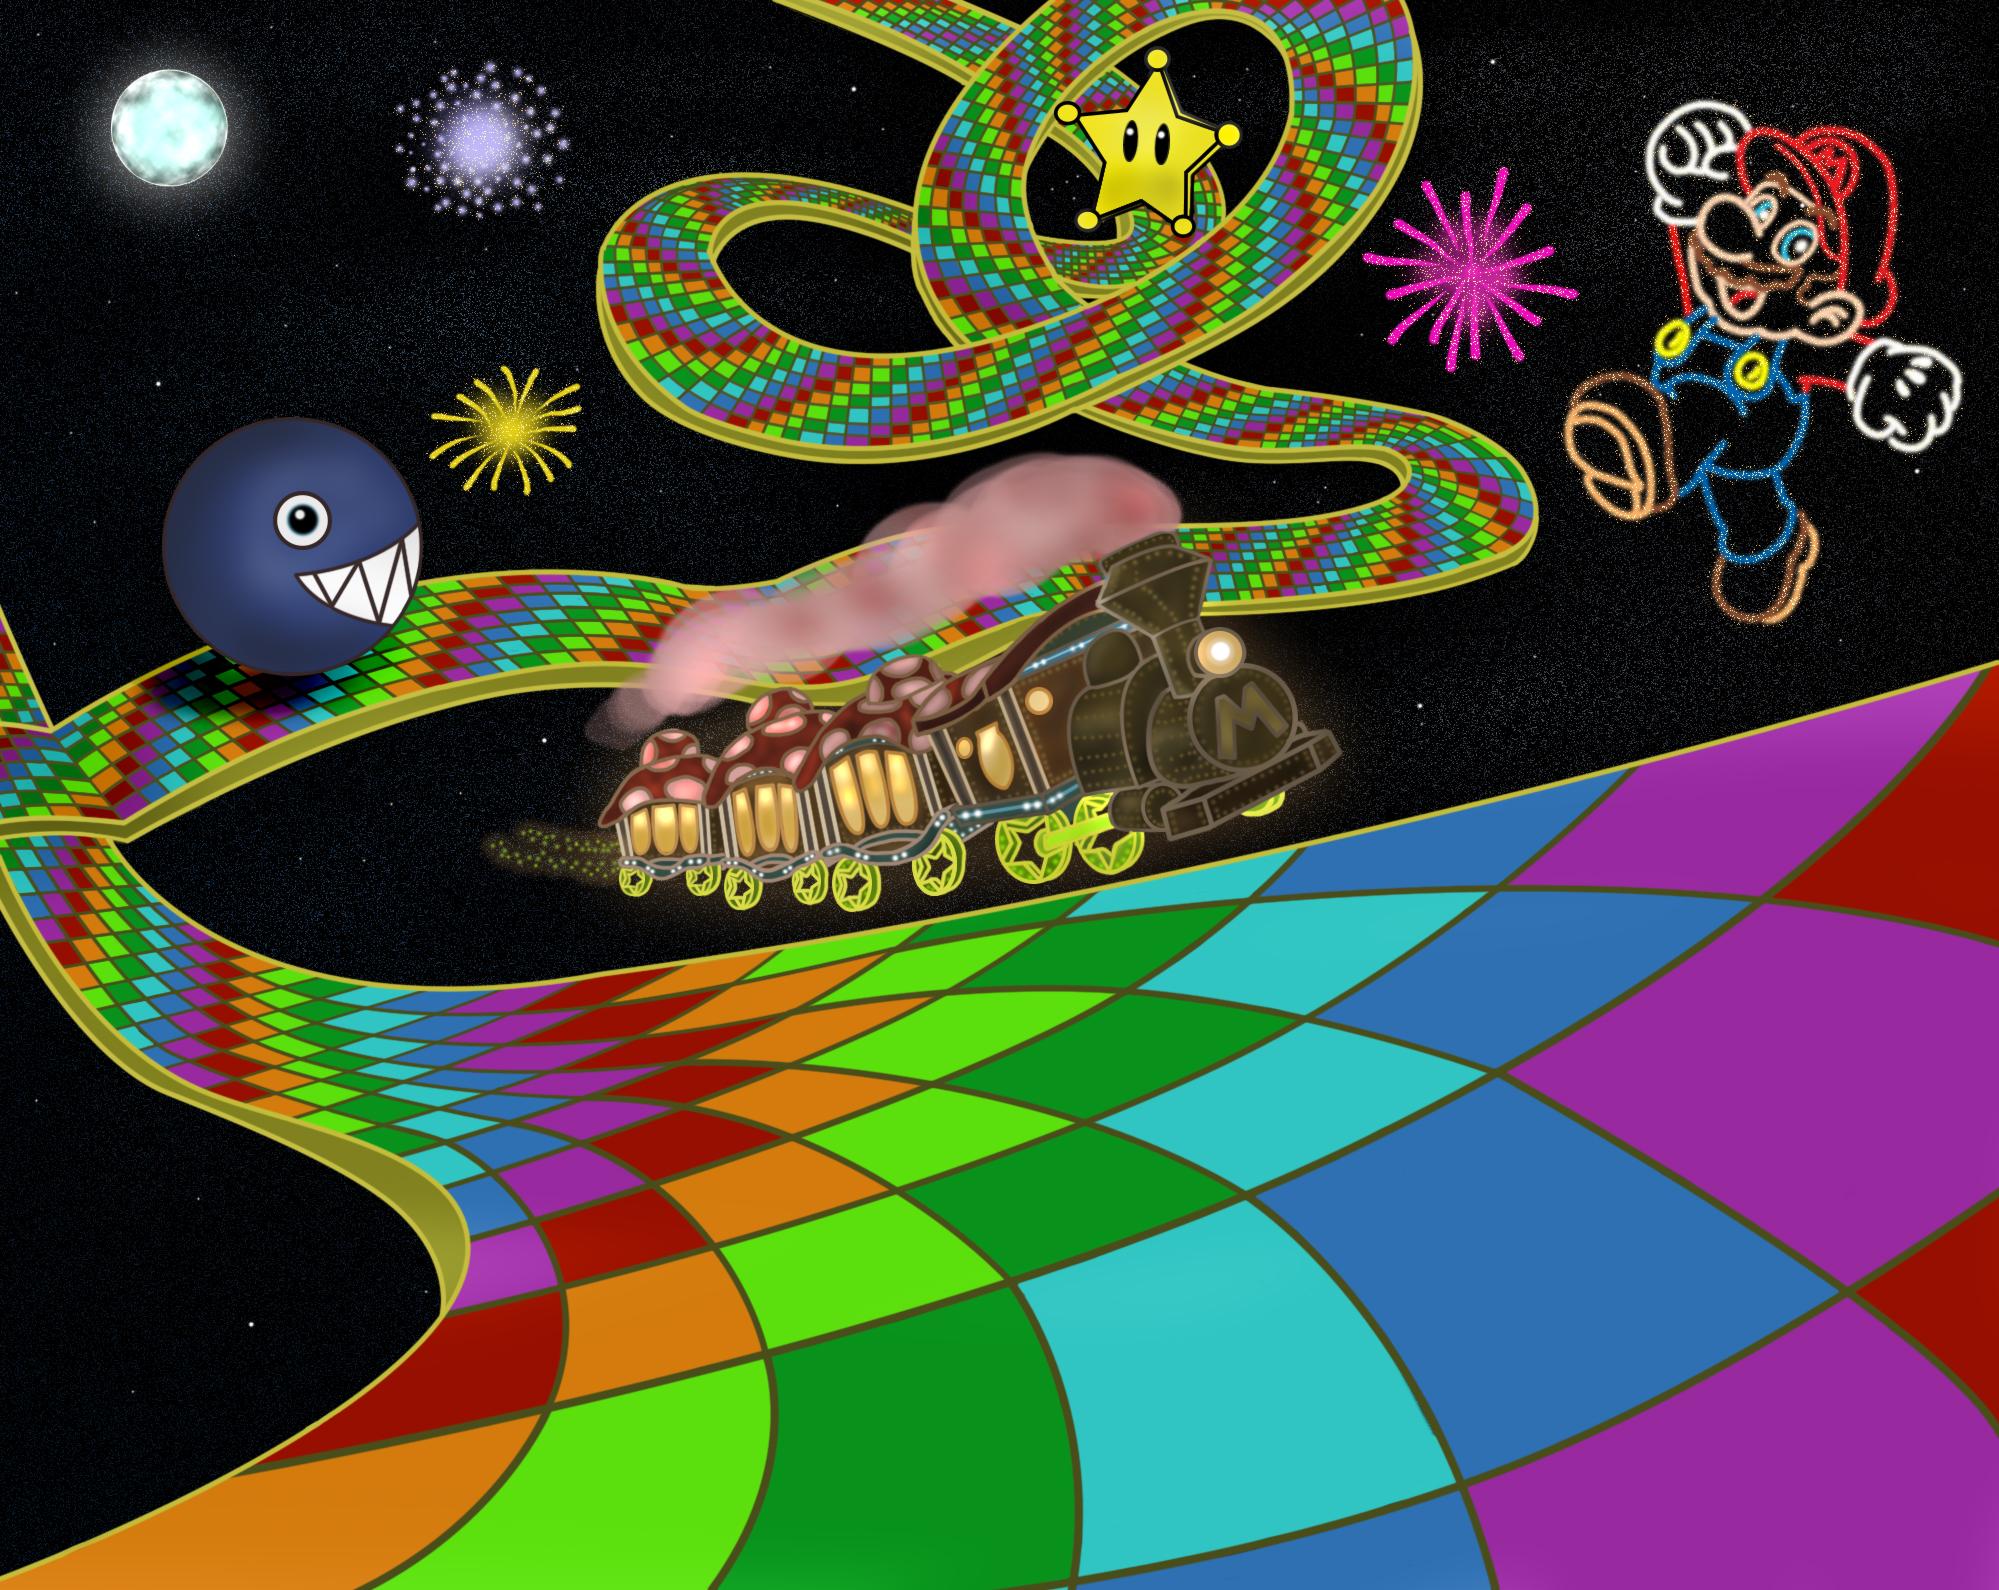 (N64) Rainbow Road by NY-Disney-fan1955